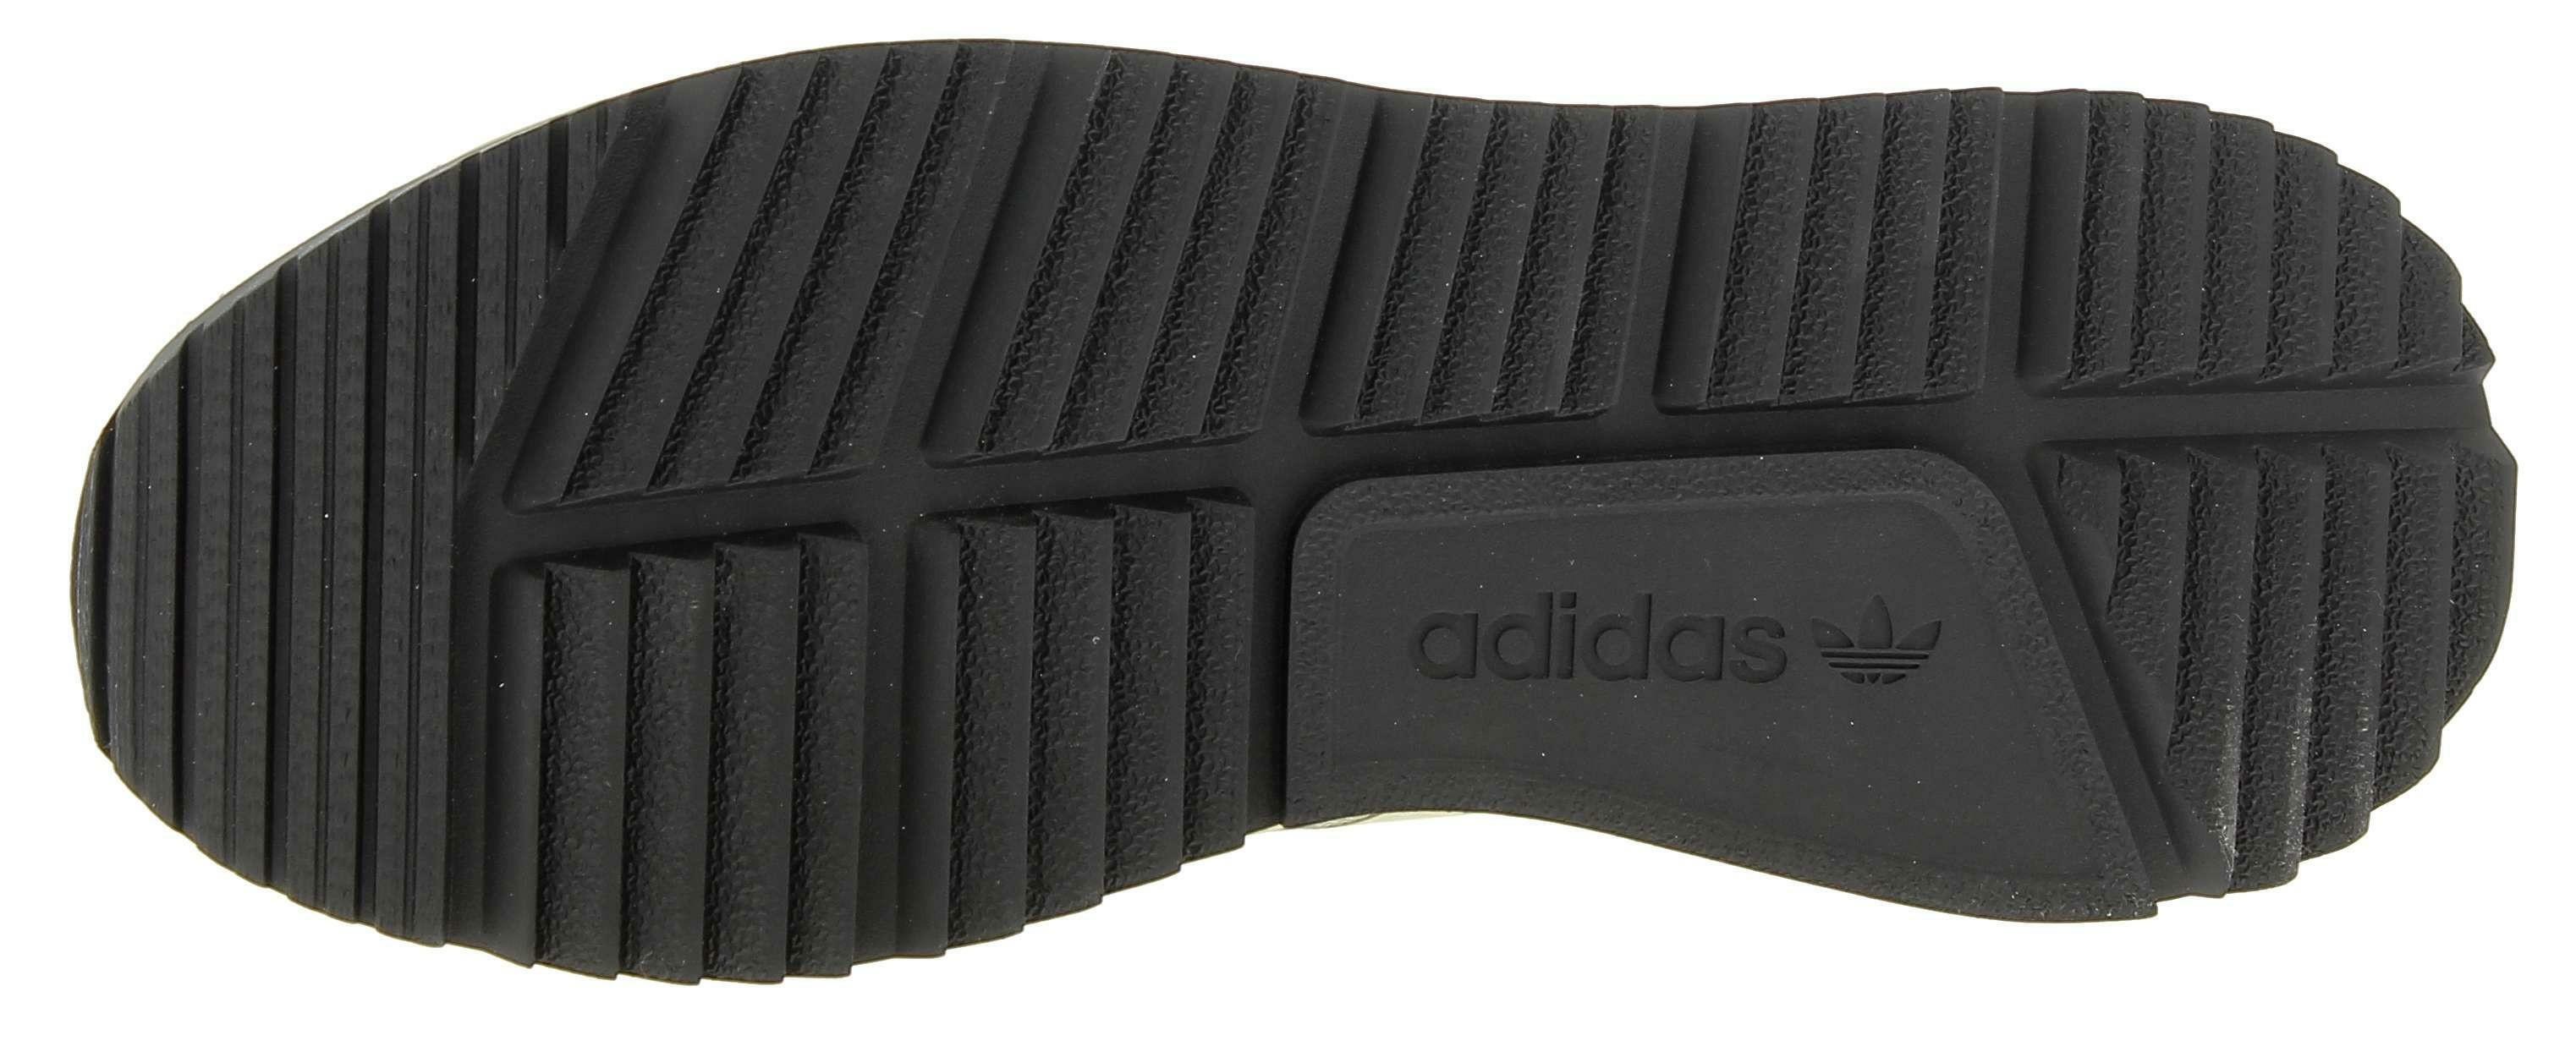 adidas adidas x plr snkrboot scarpe sportive uomo verde bz0670